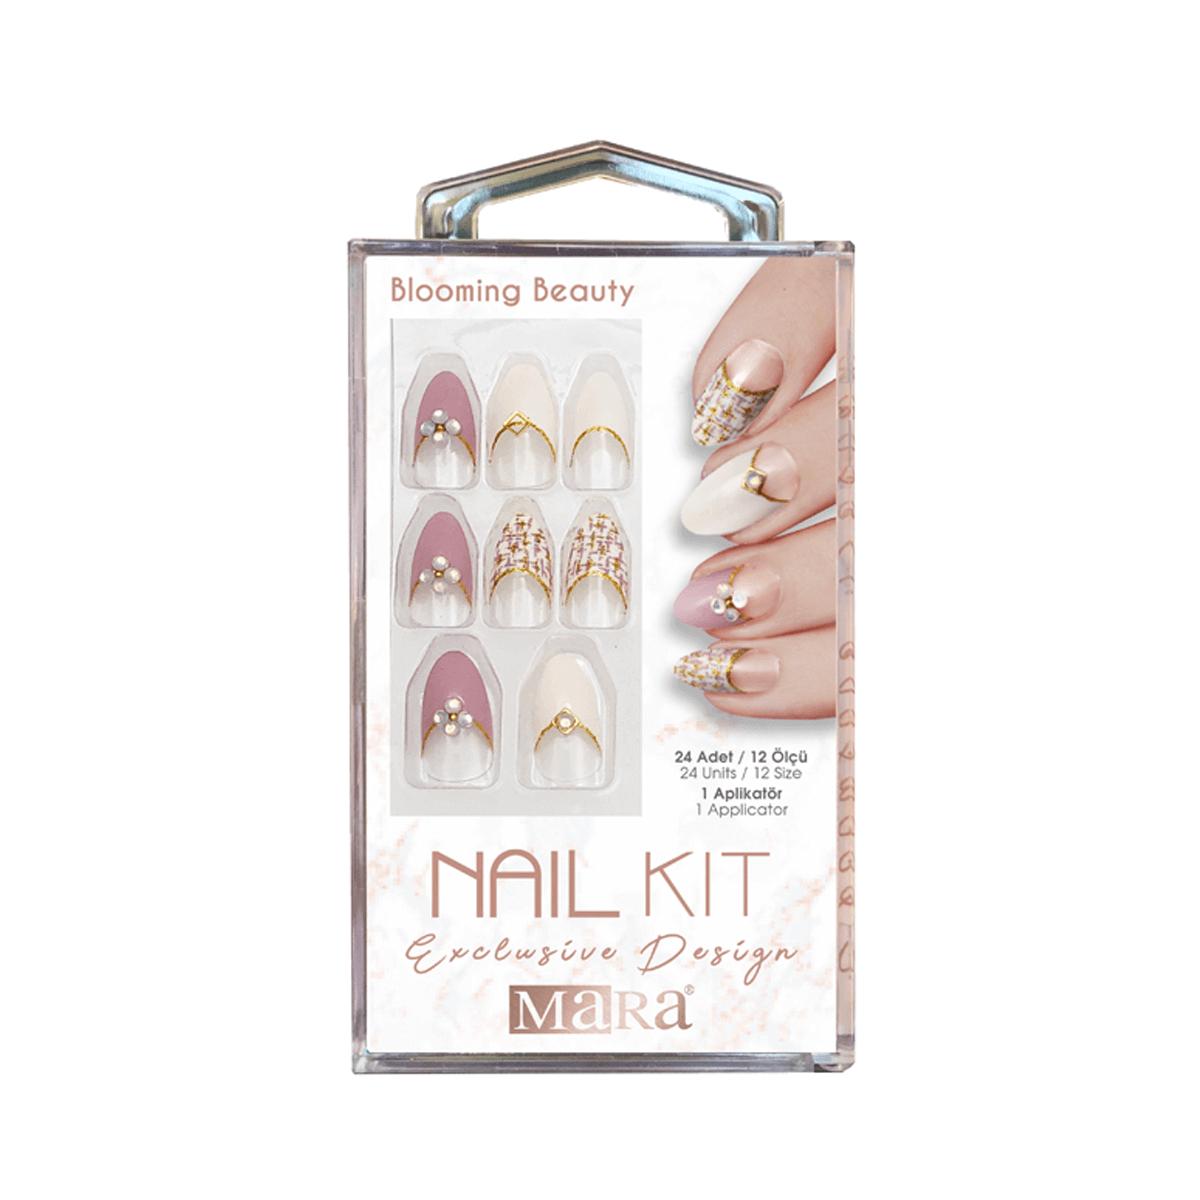 Nail Kit Takma Tırnak Blooming Beauty